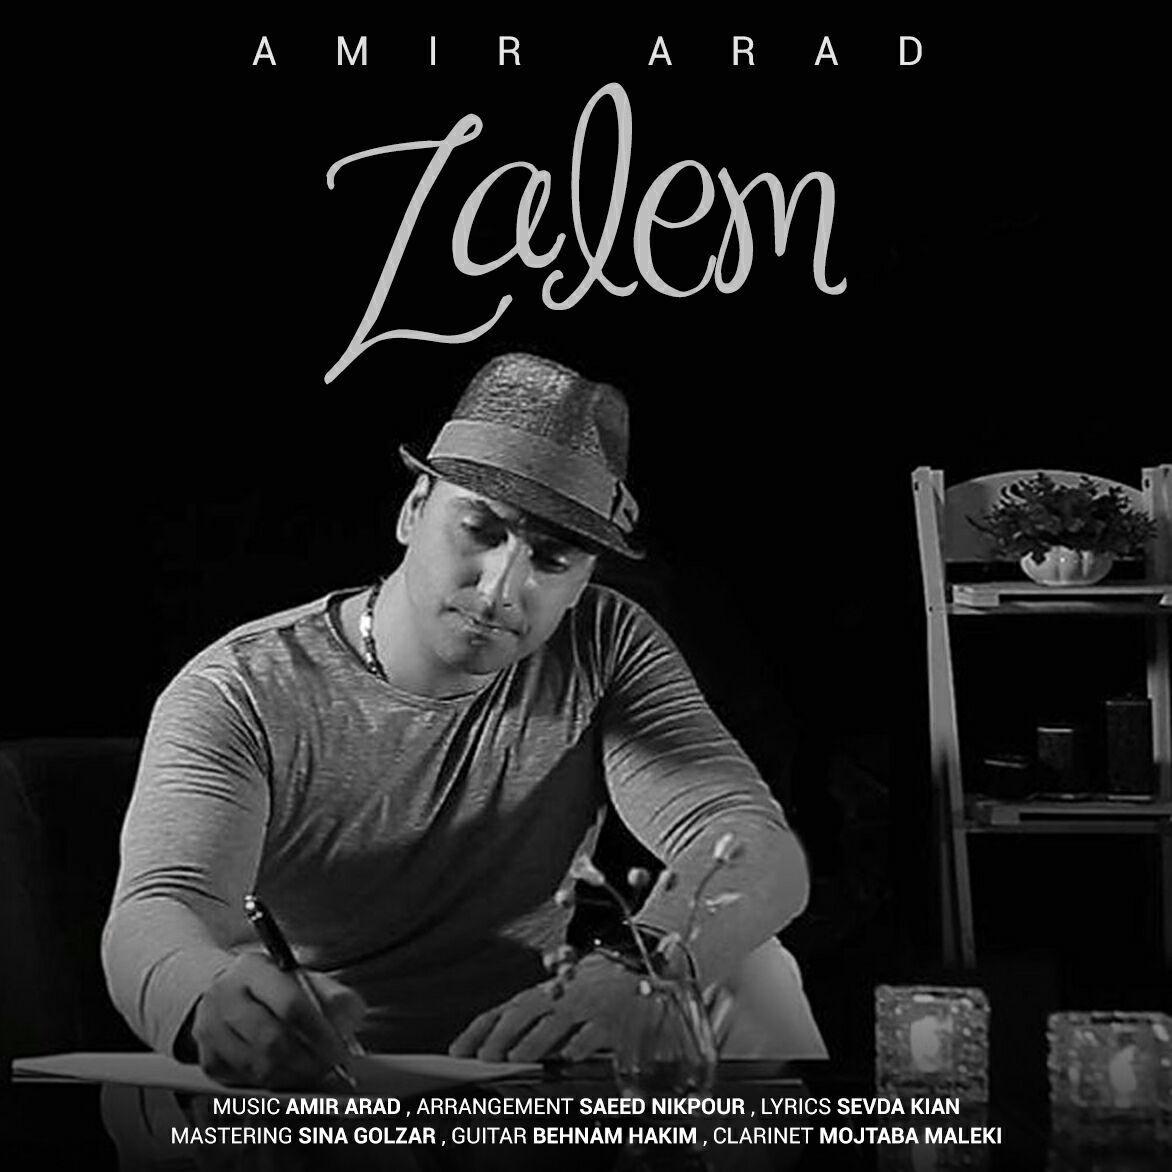 Amir Arad – Zalem